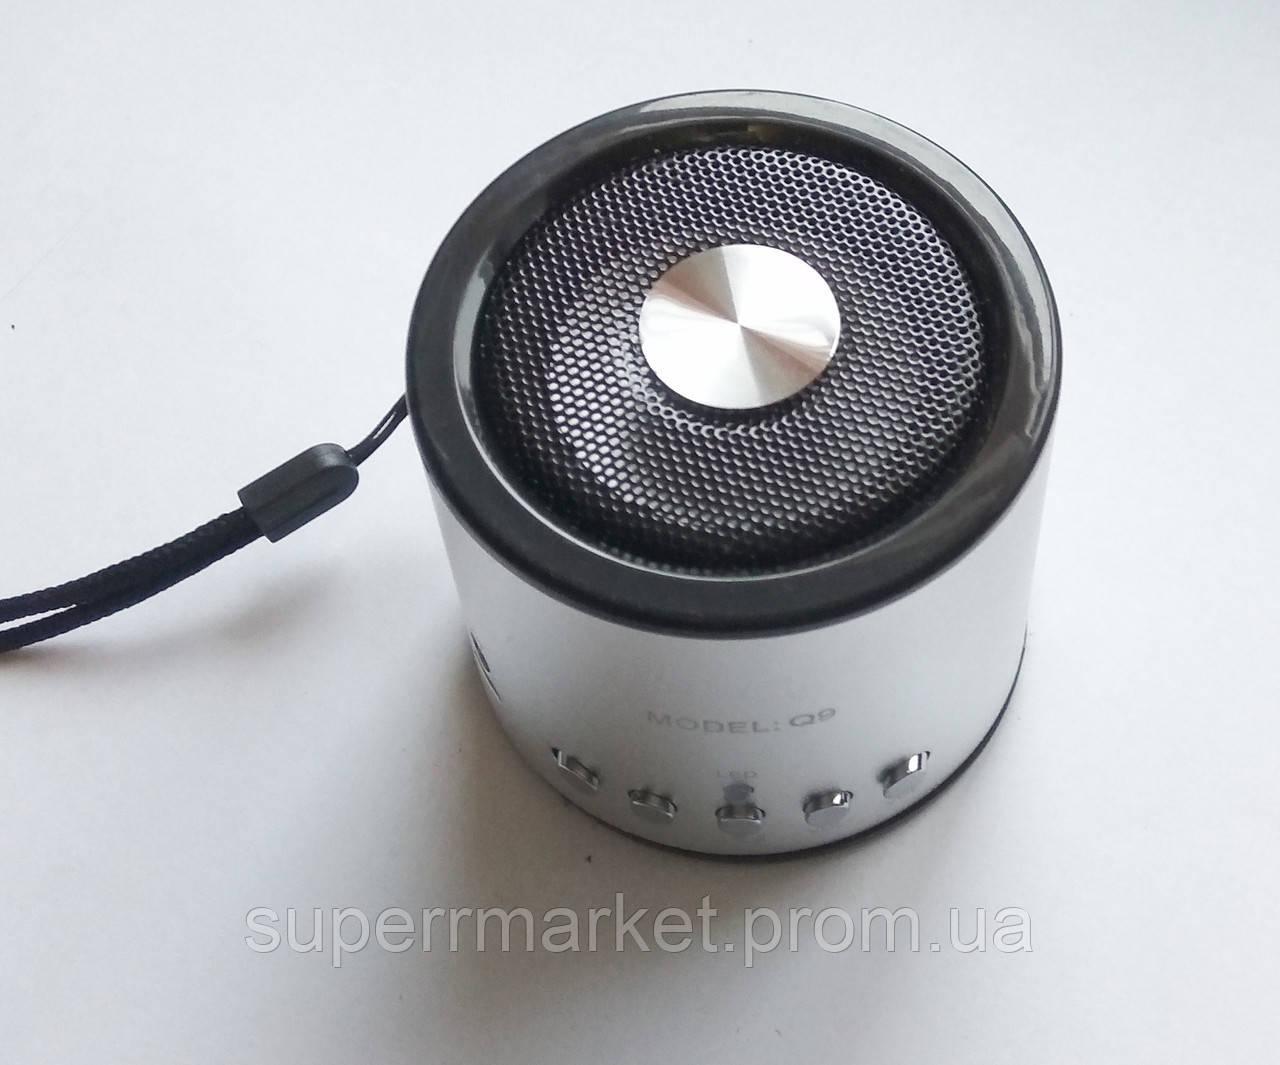 Портативная колонка Mini bluetooth speaker  WS-Q9